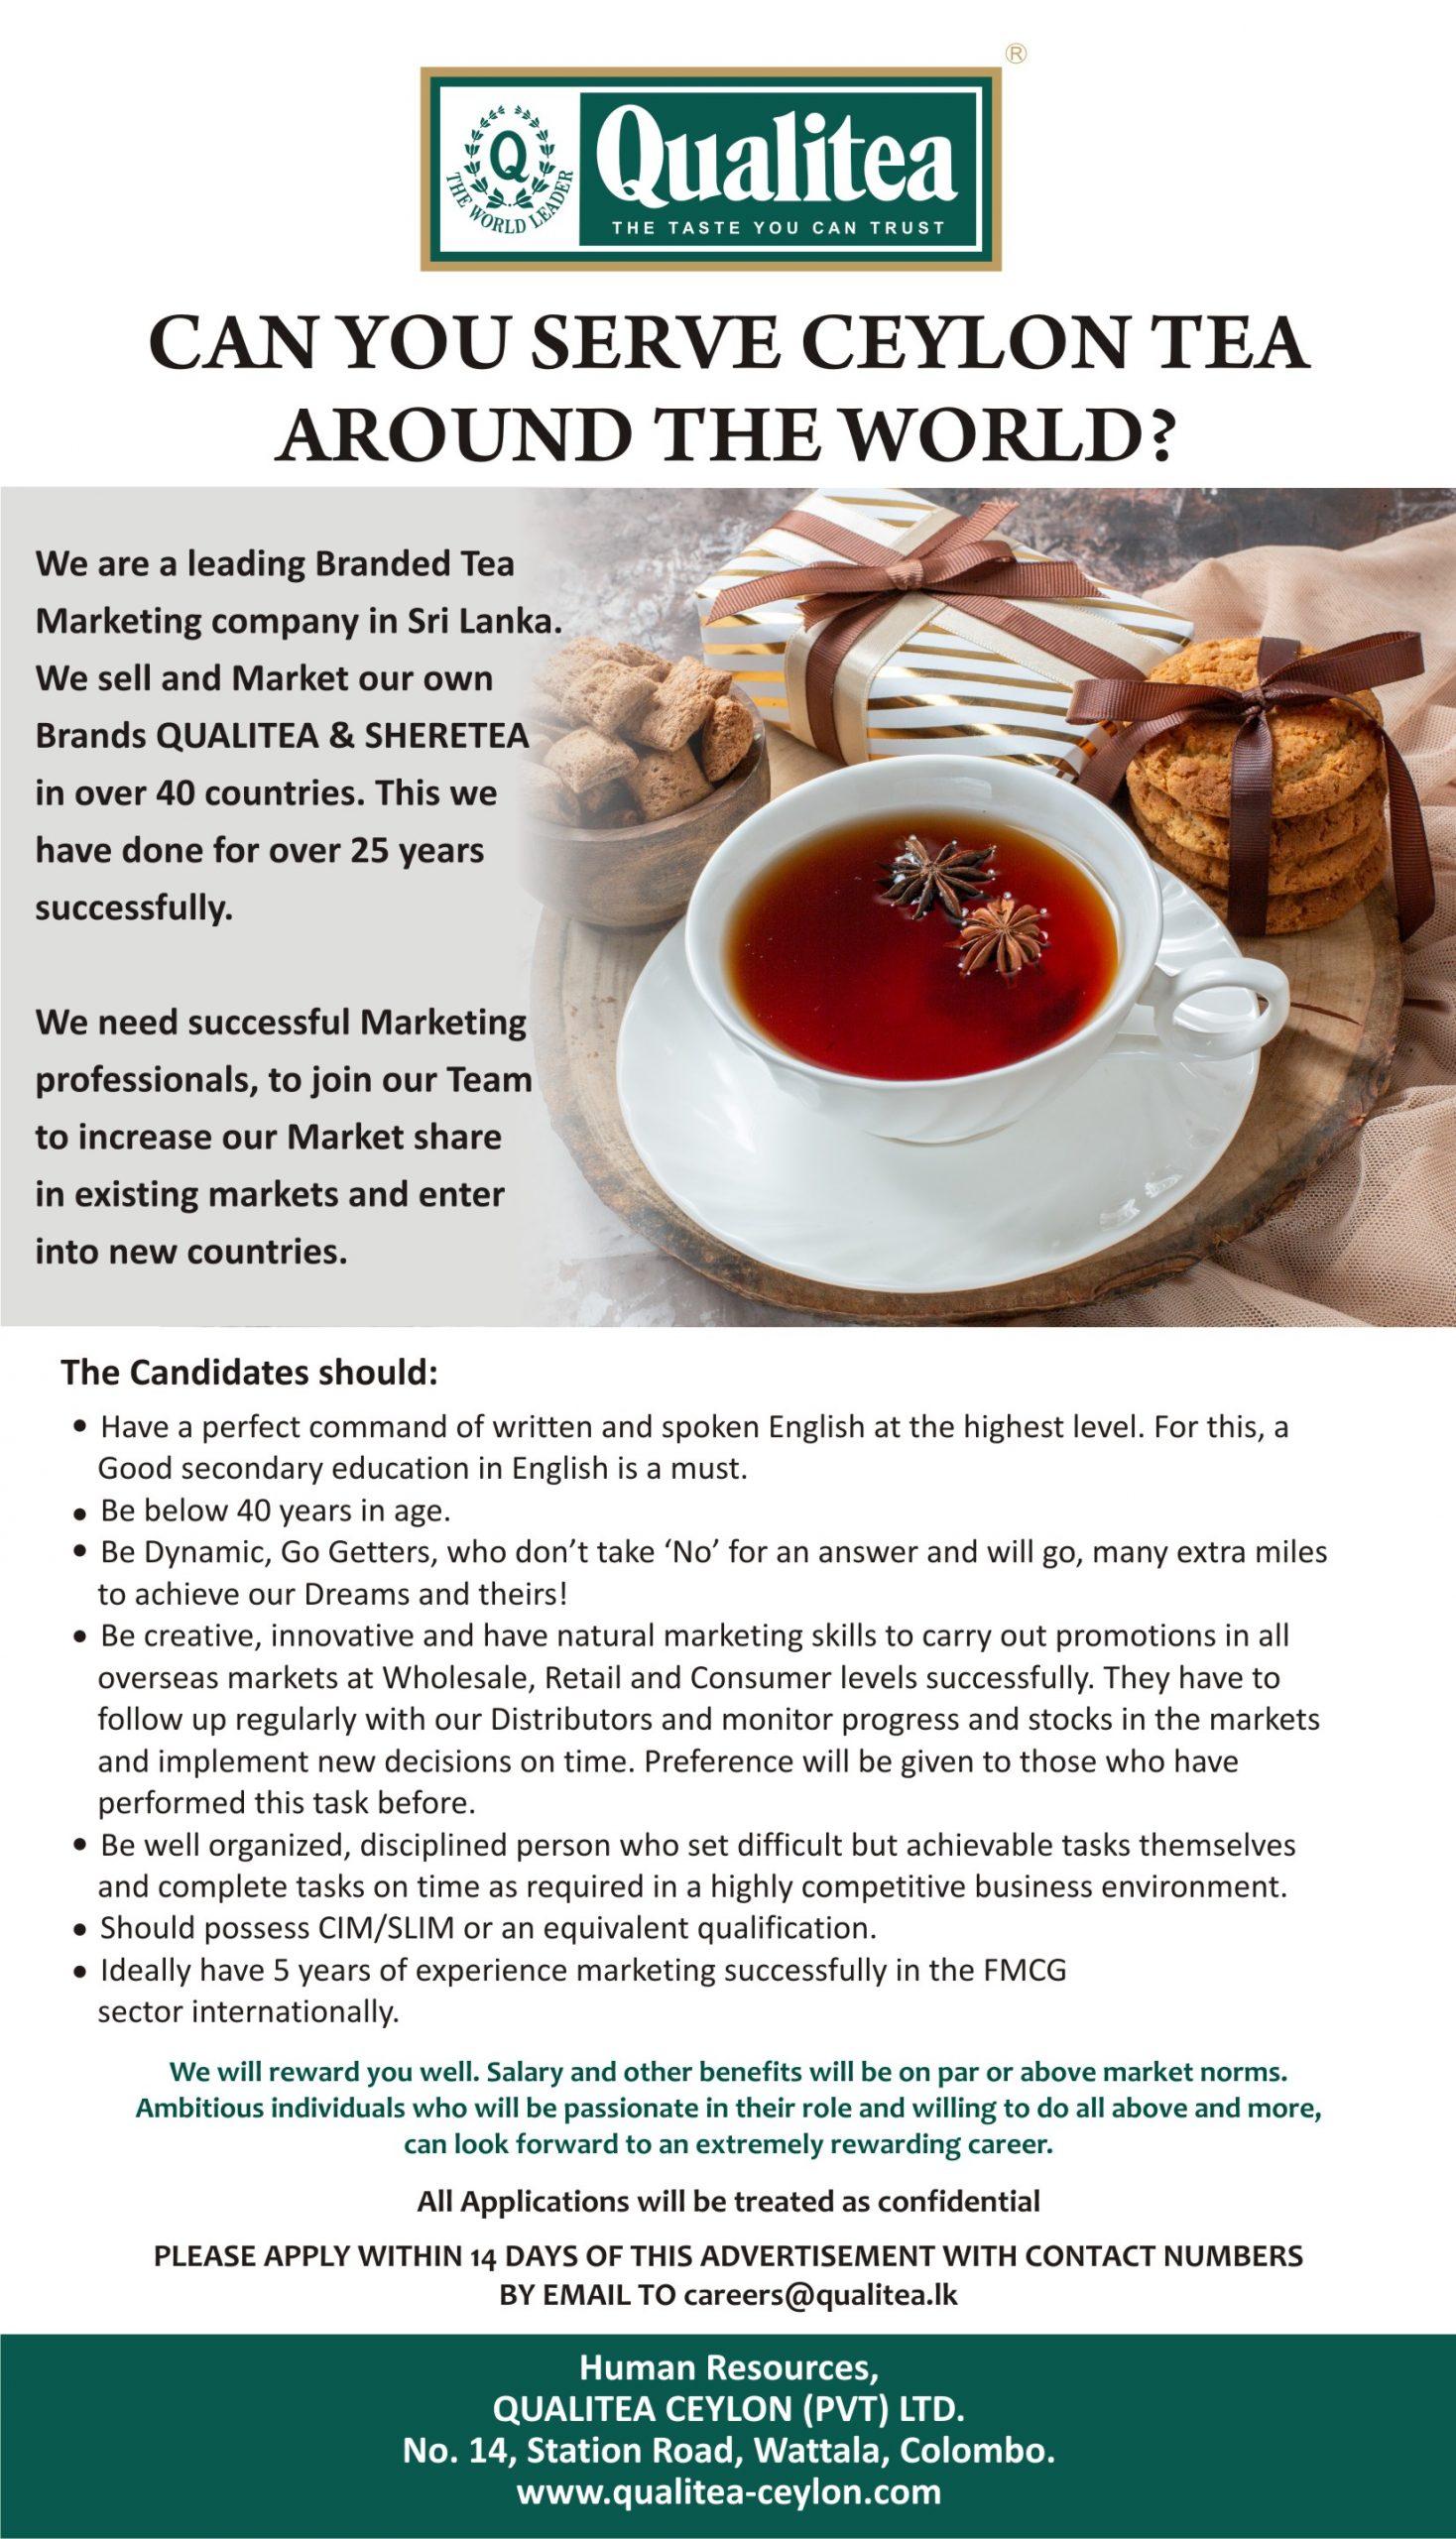 Marketing vacancy from Qualitea Ceylon